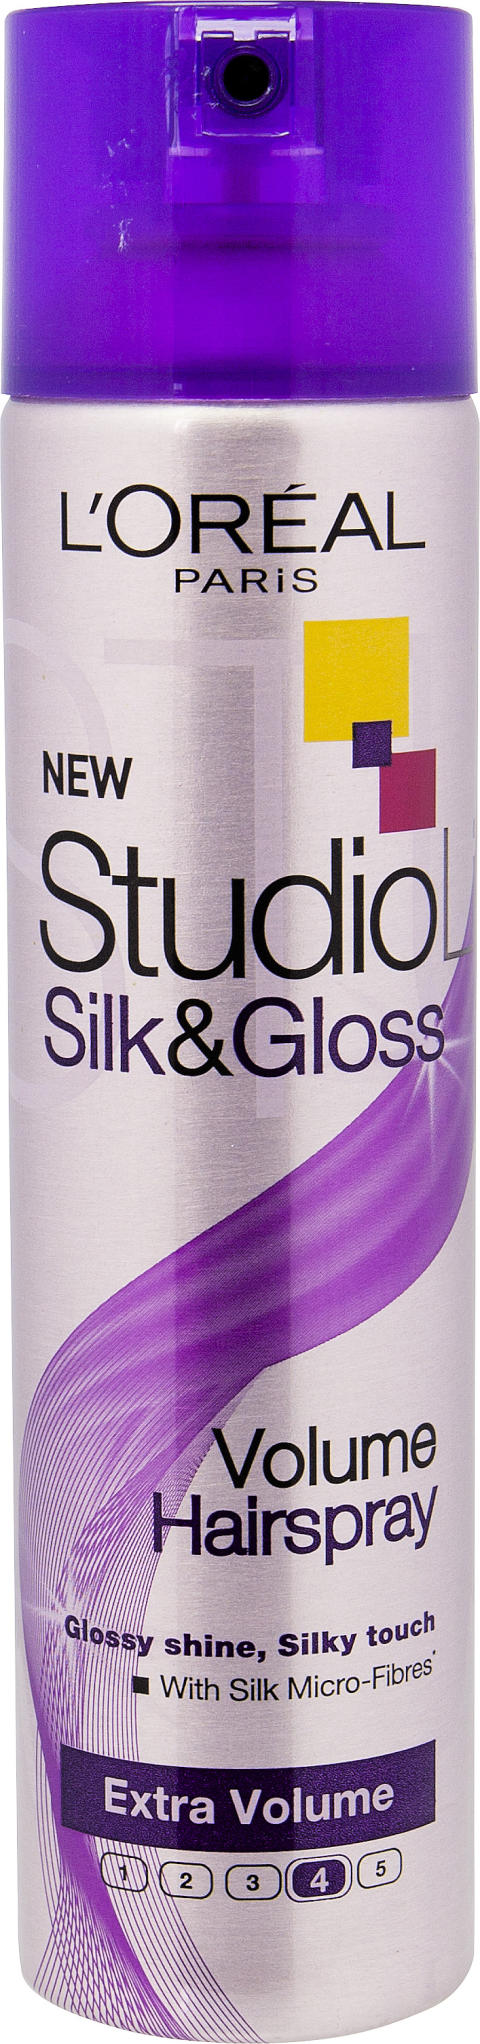 Studio Line Silk & Gloss Volume Spray